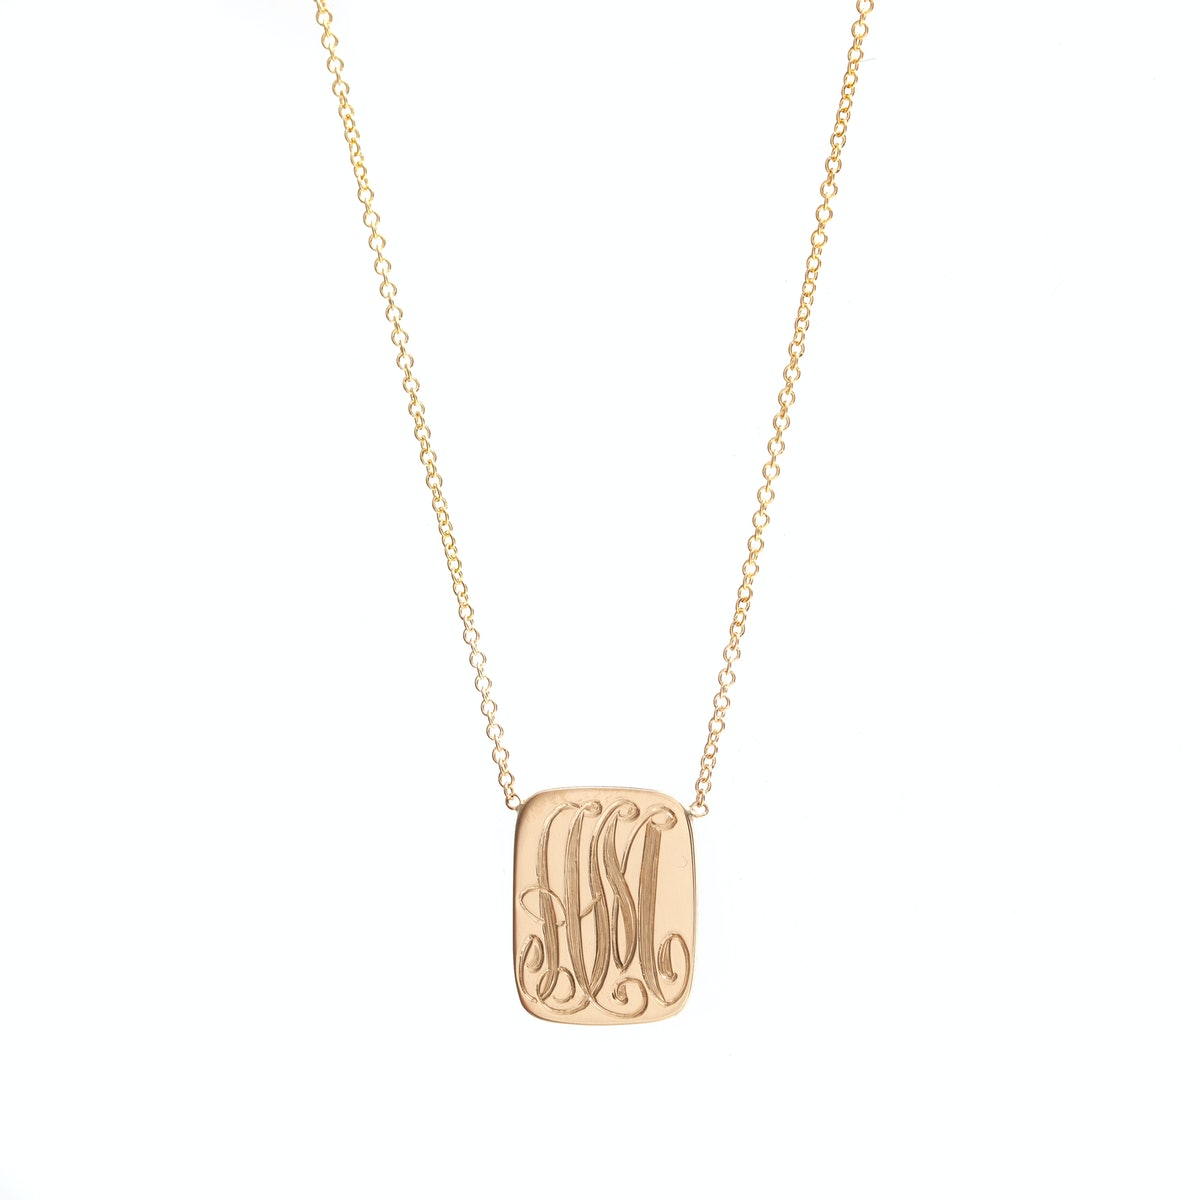 Ariel Gordon necklace